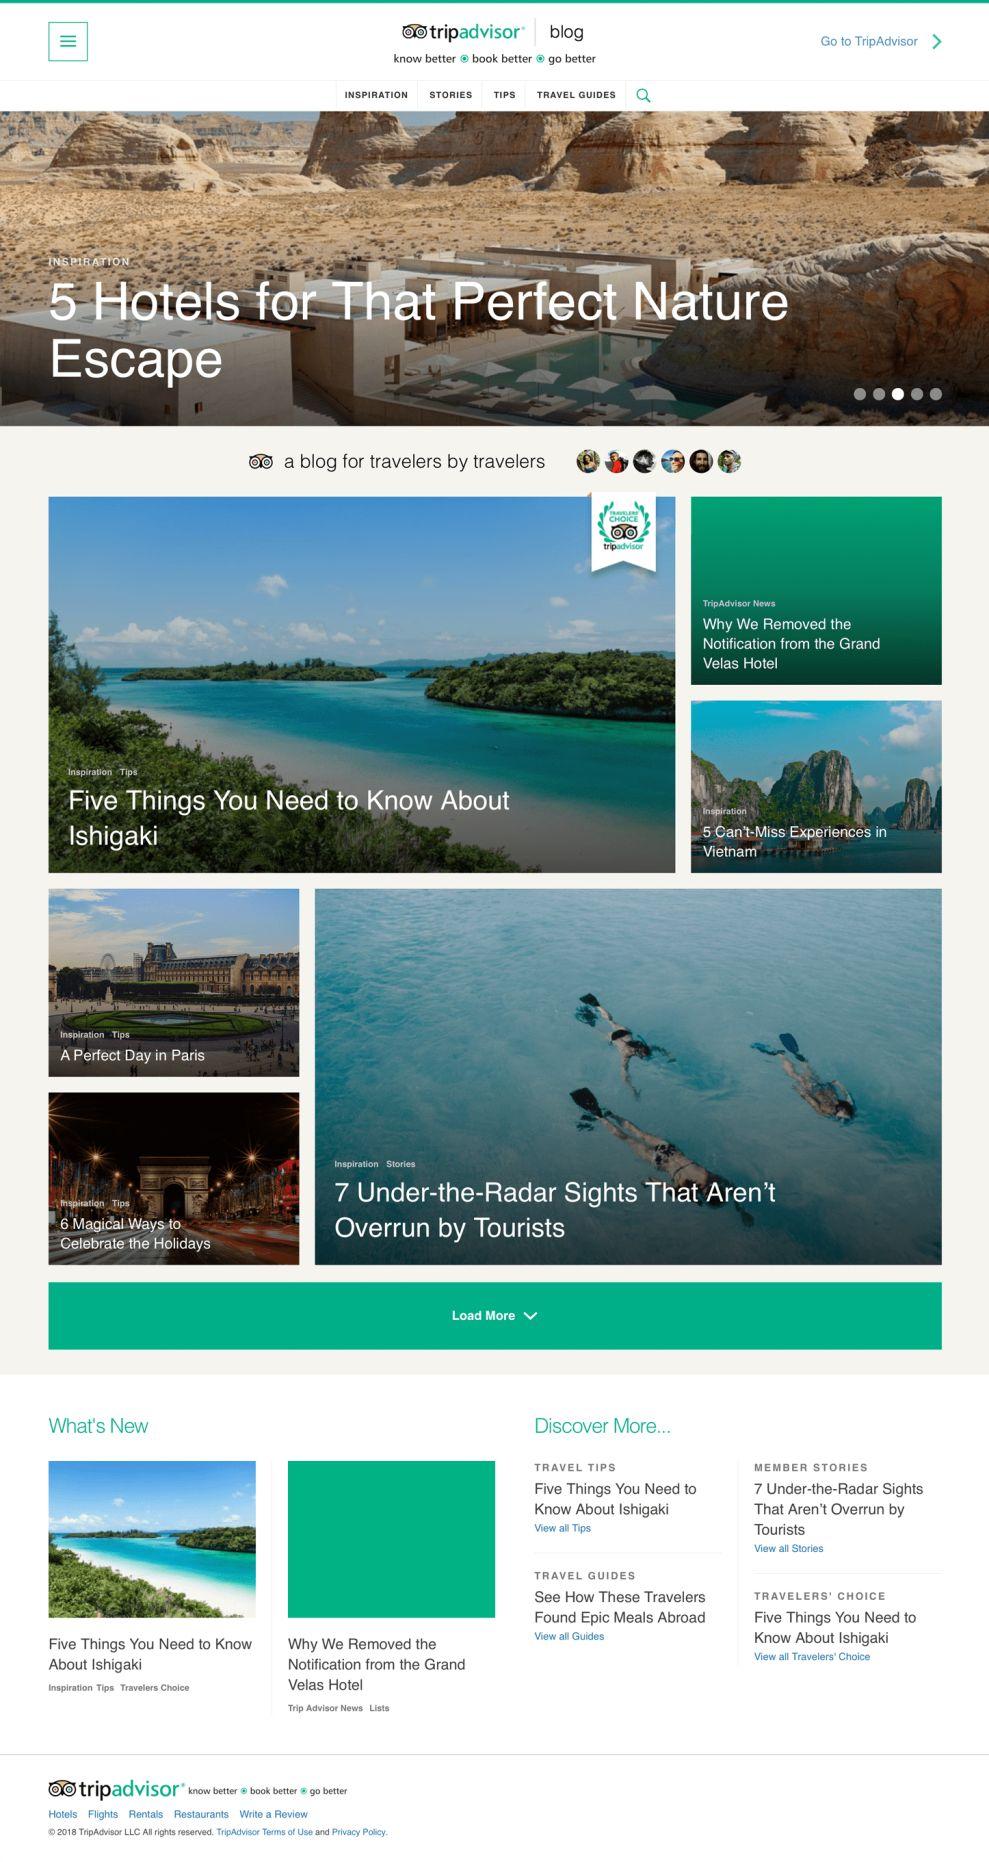 TripAdvisor Clean Website Design Blog